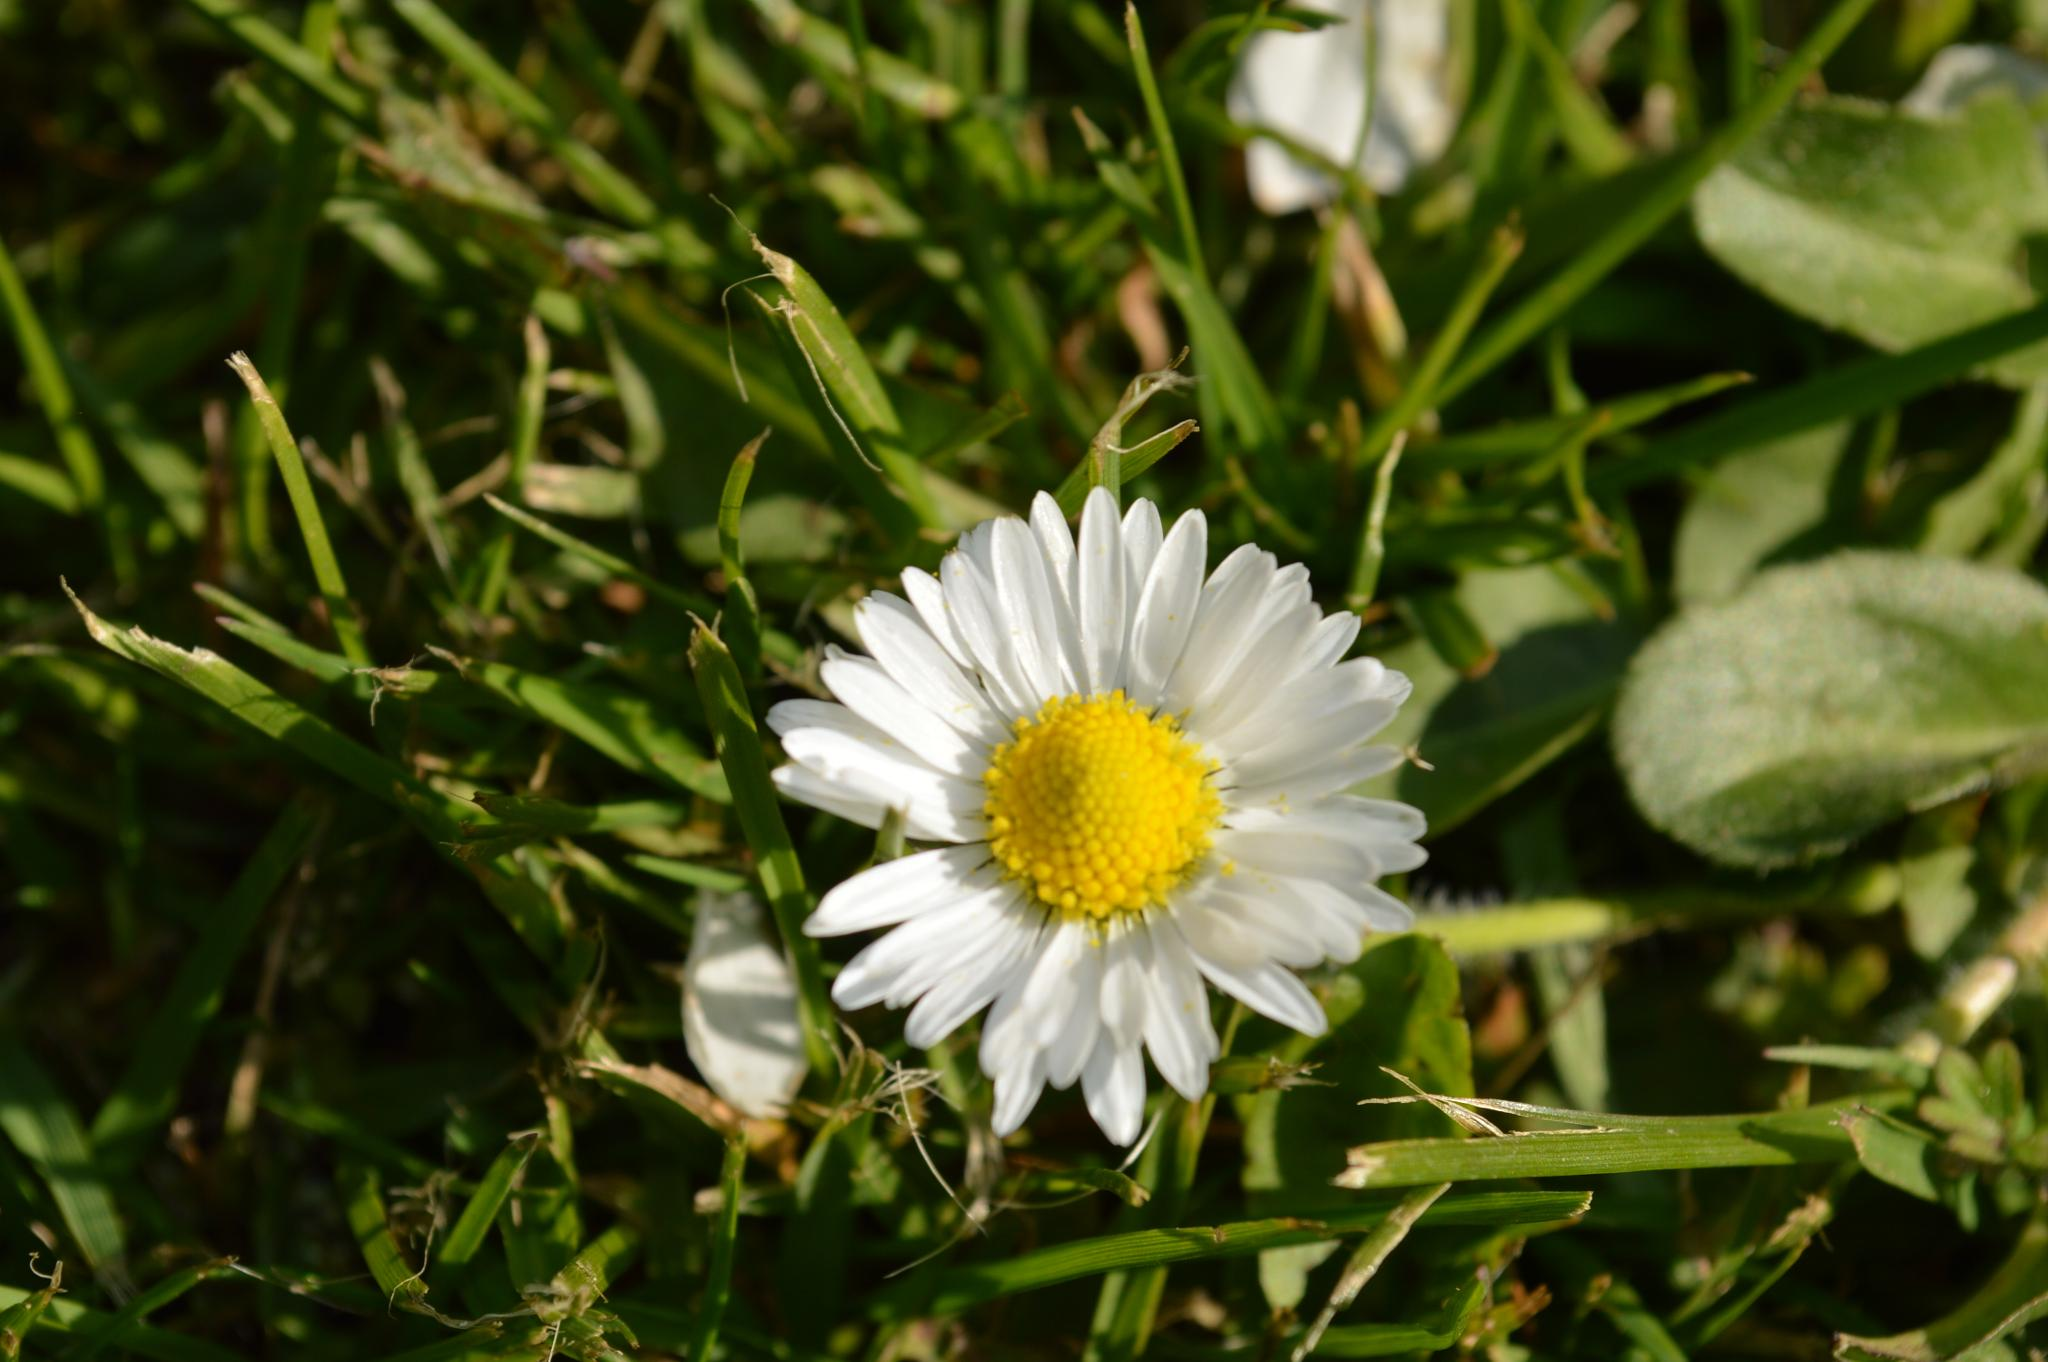 spring by Mariola mularczyk